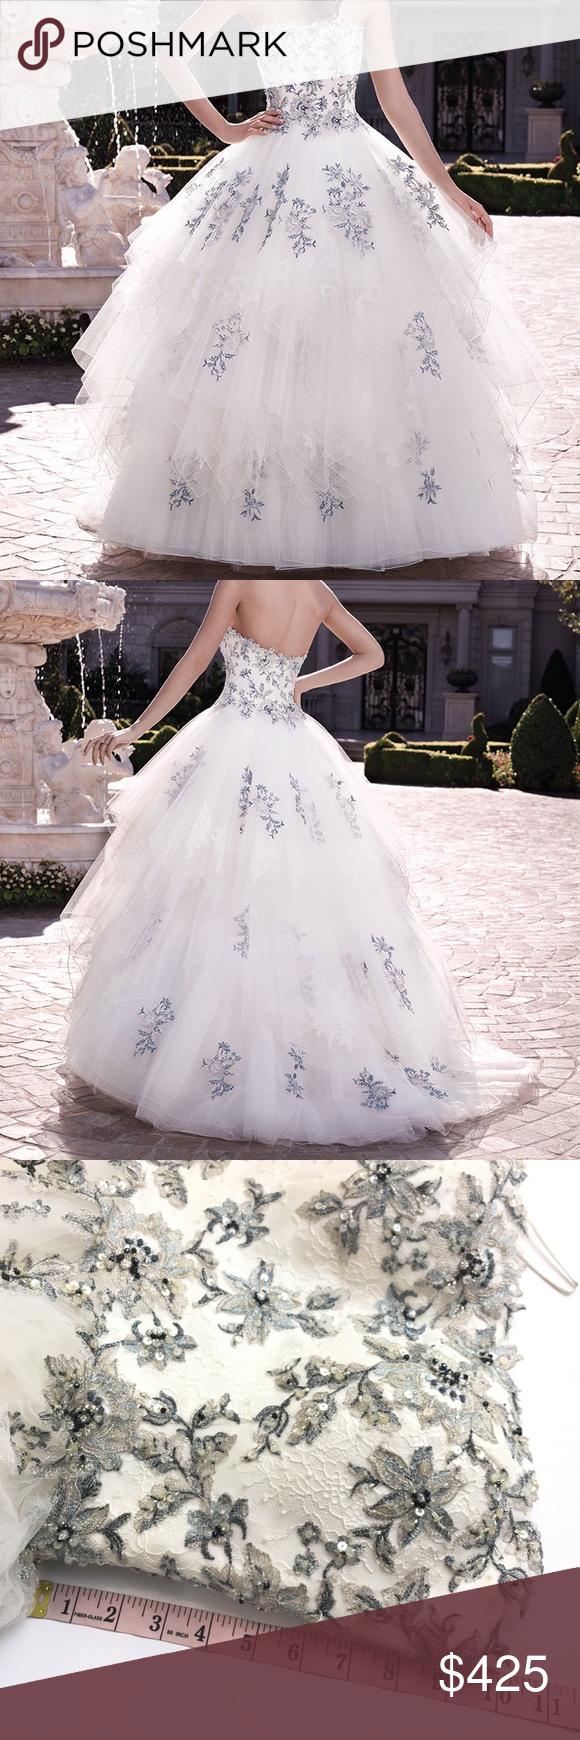 Casablanca uchollywood glamourud wedding dress casablanca